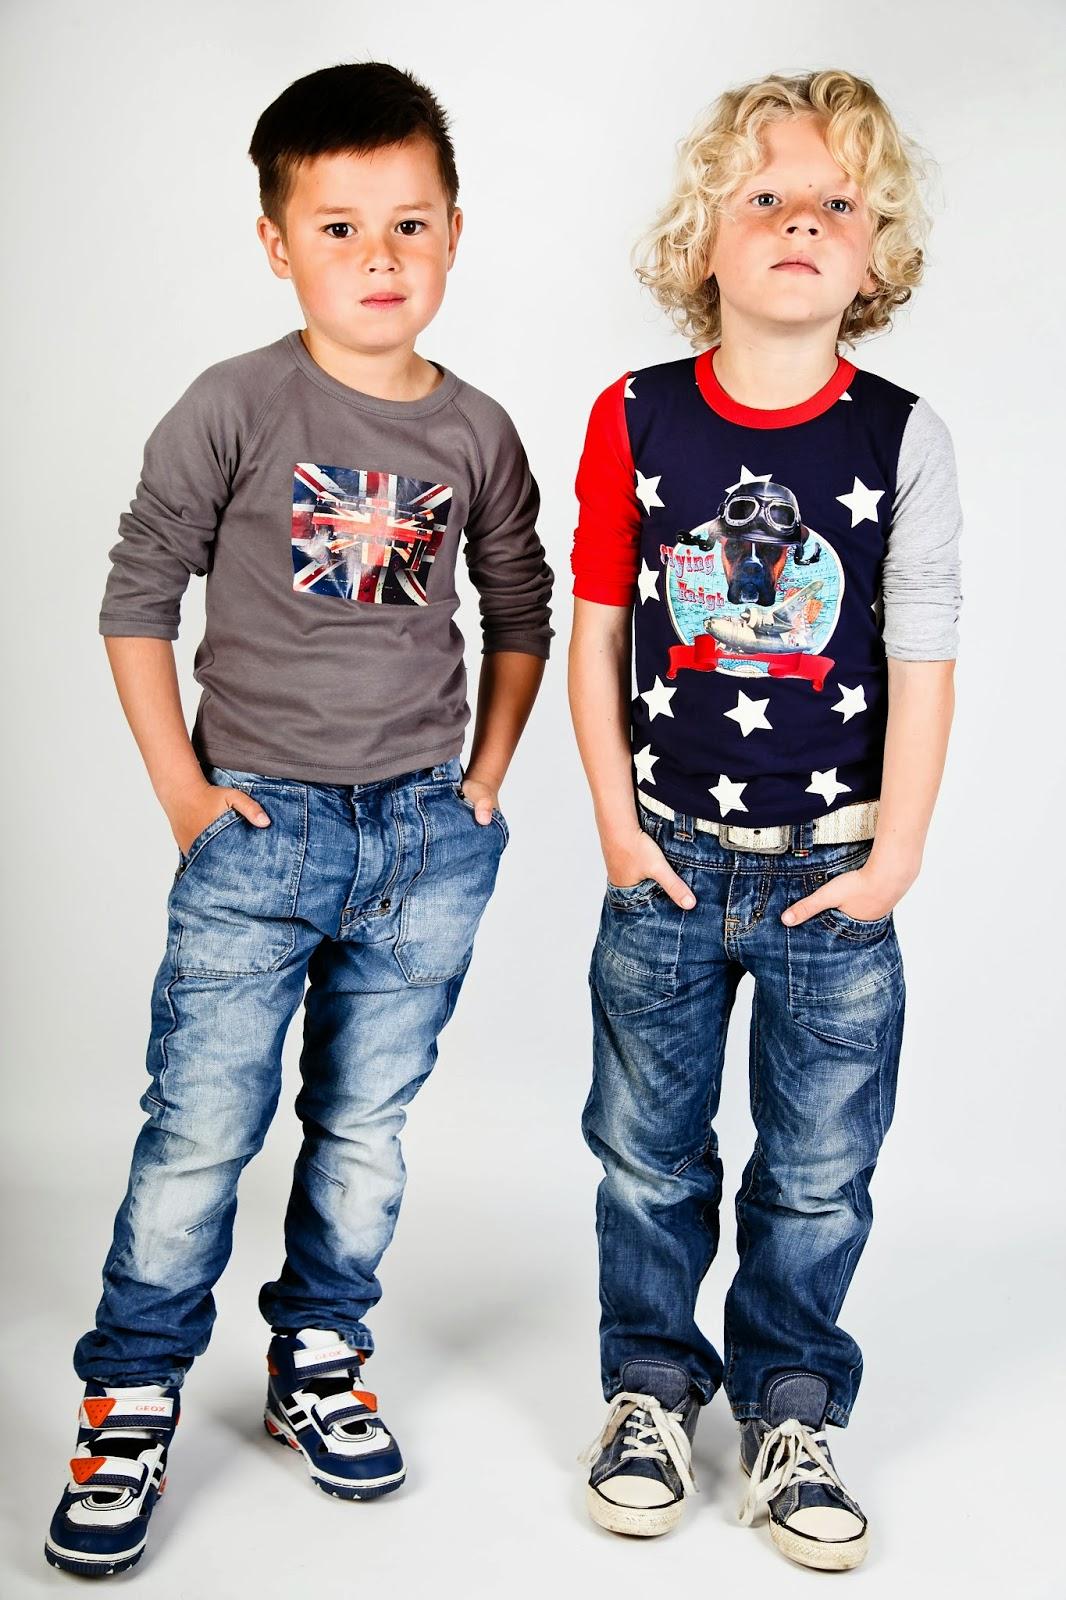 Coole Kinderkleding.Coole Kinderkleding Blog September 2013